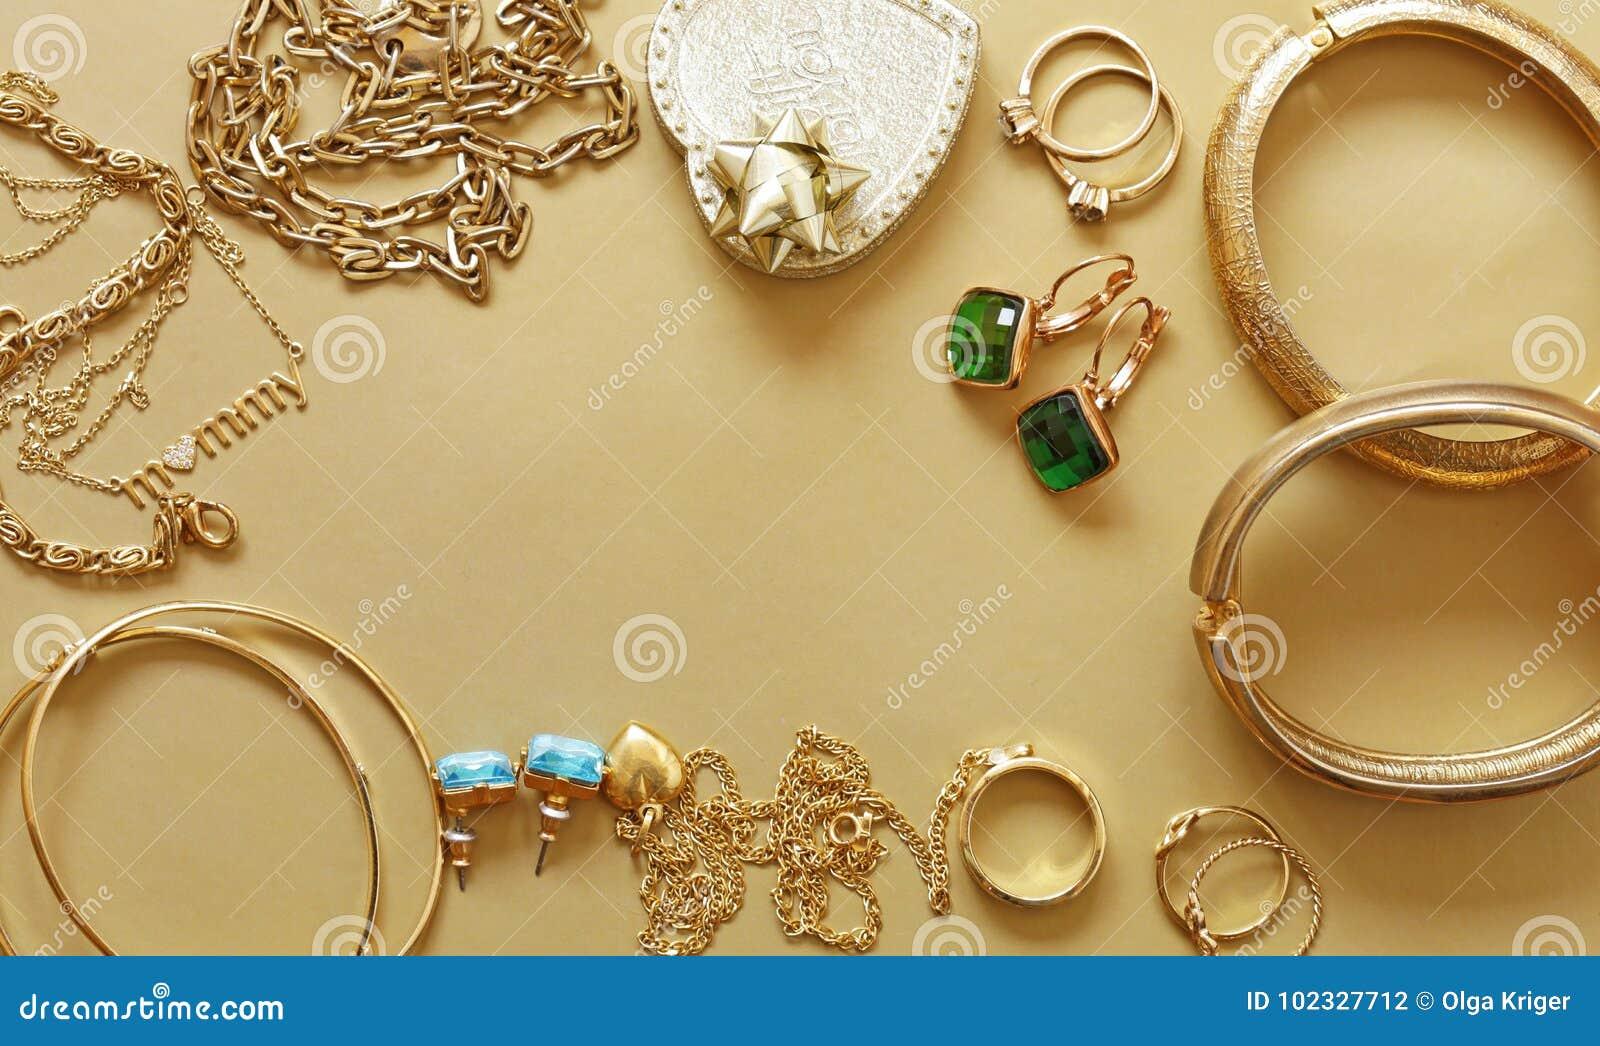 008d6b29b8 Χρυσό κόσμημα - κρεμαστά κοσμήματα